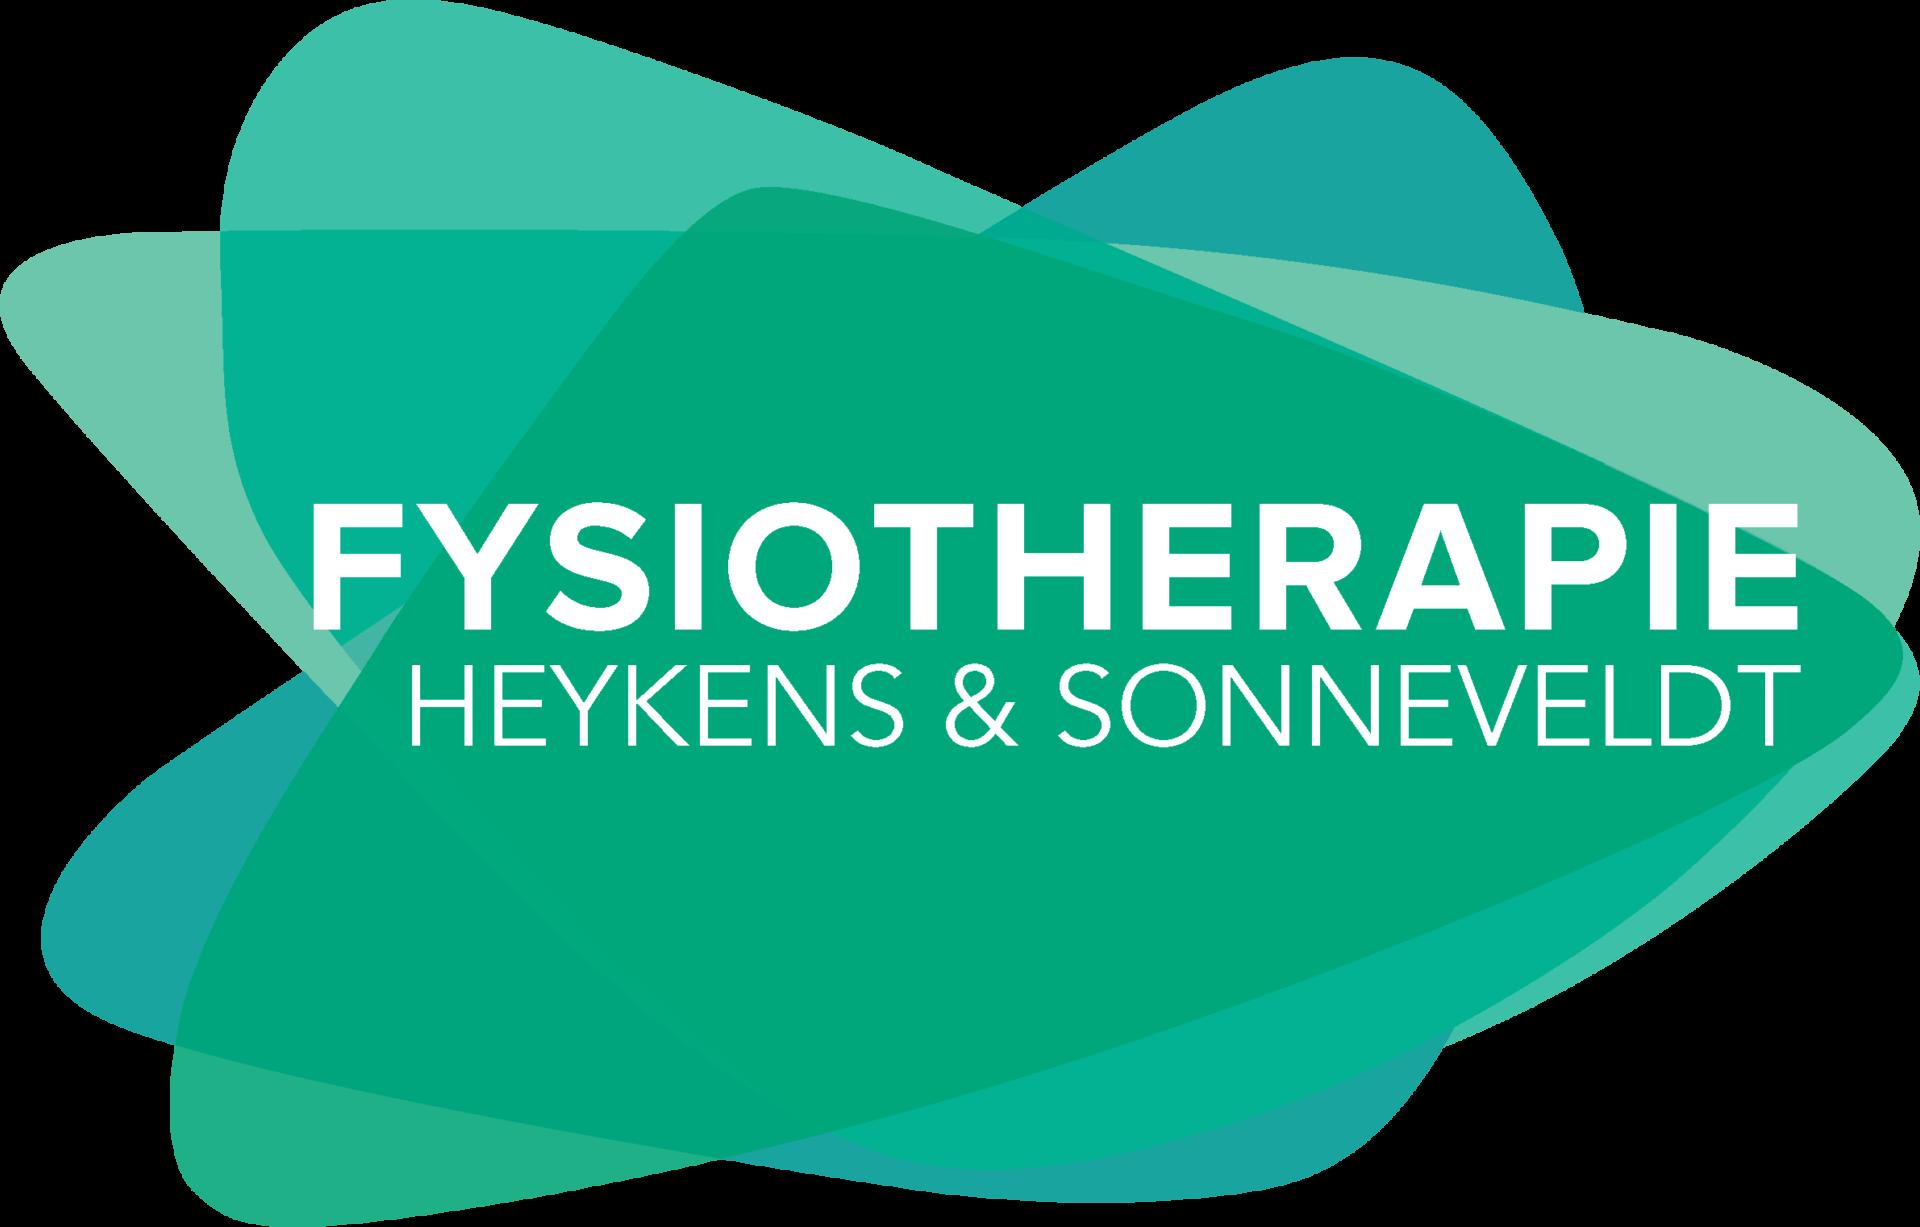 Fysiotherapie Heykens & Sonneveldt